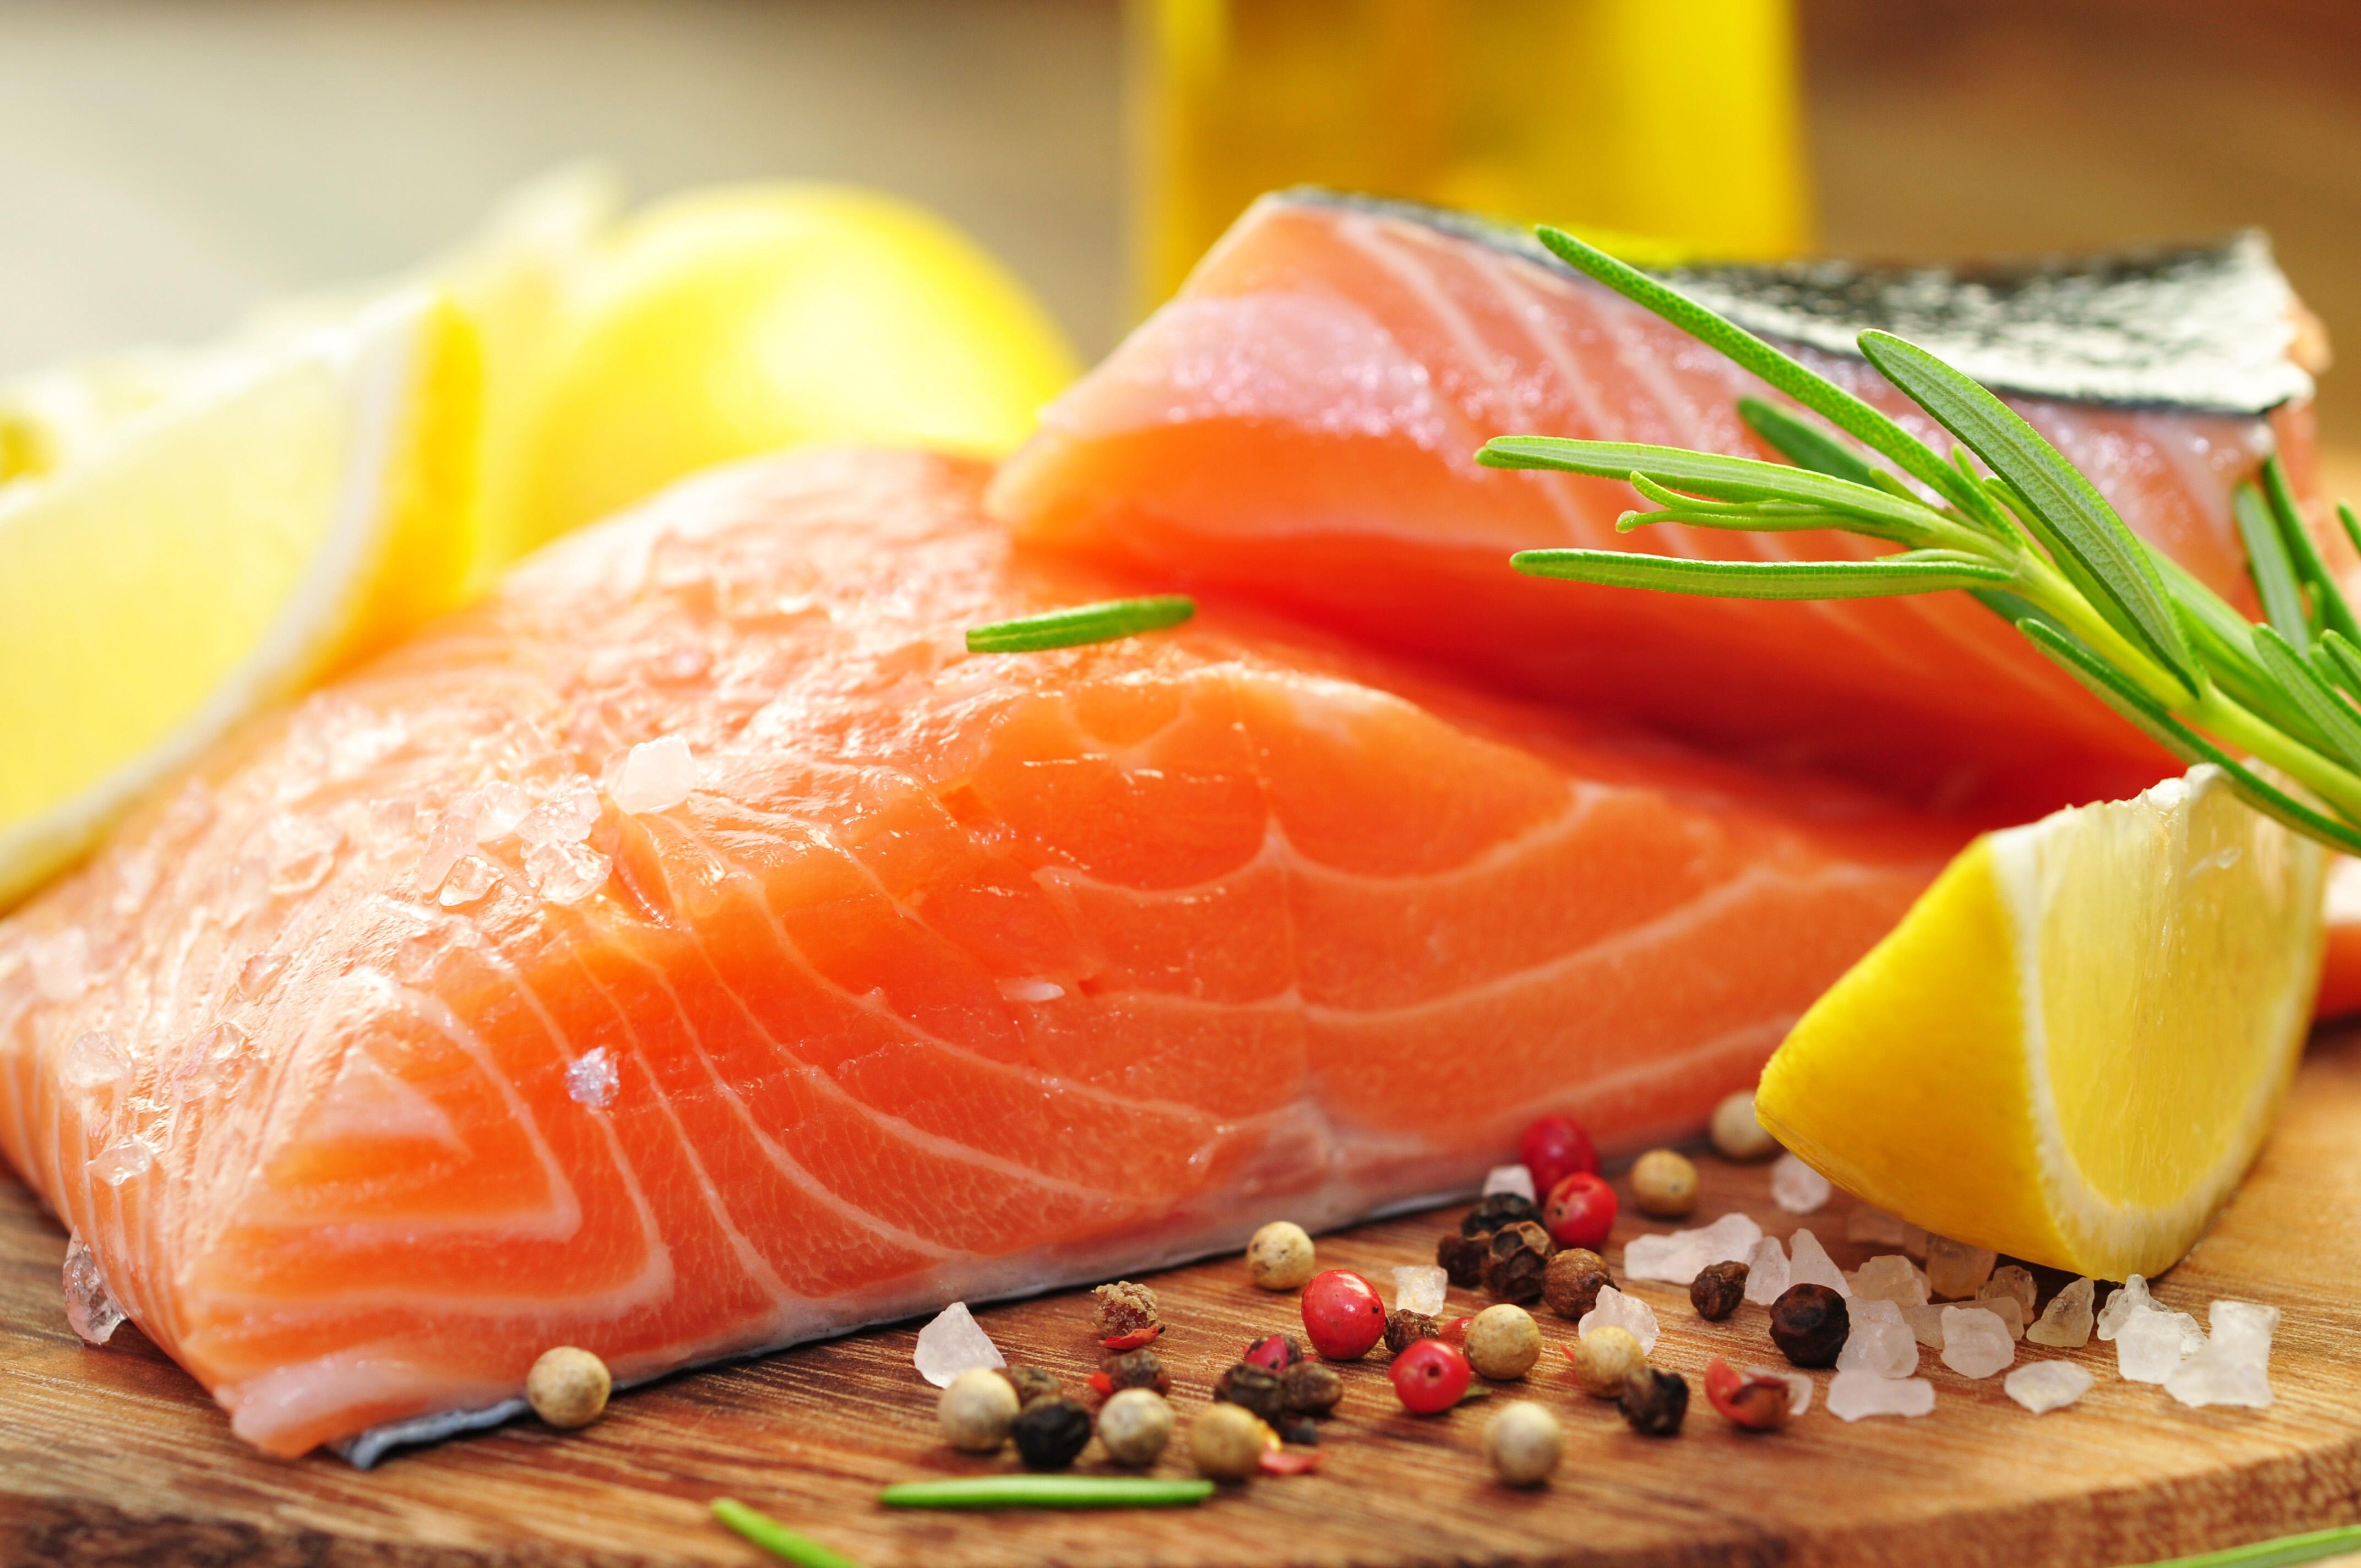 سمك السلمون المشوي بالأعشاب والليمون